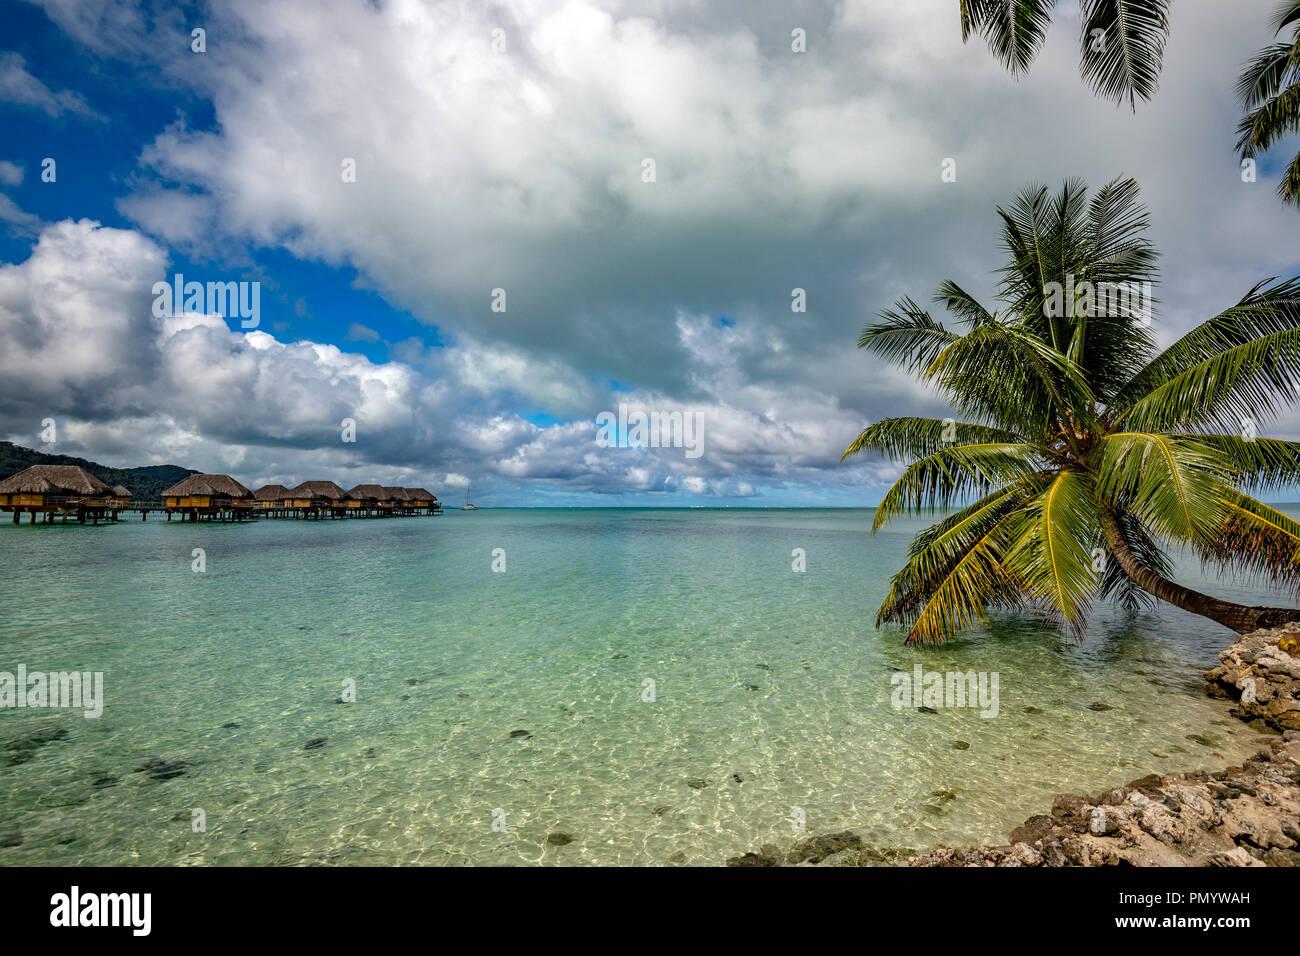 bora bora island french polynesia aerial airplane view panorama landscape, overwater bungalow - Stock Image